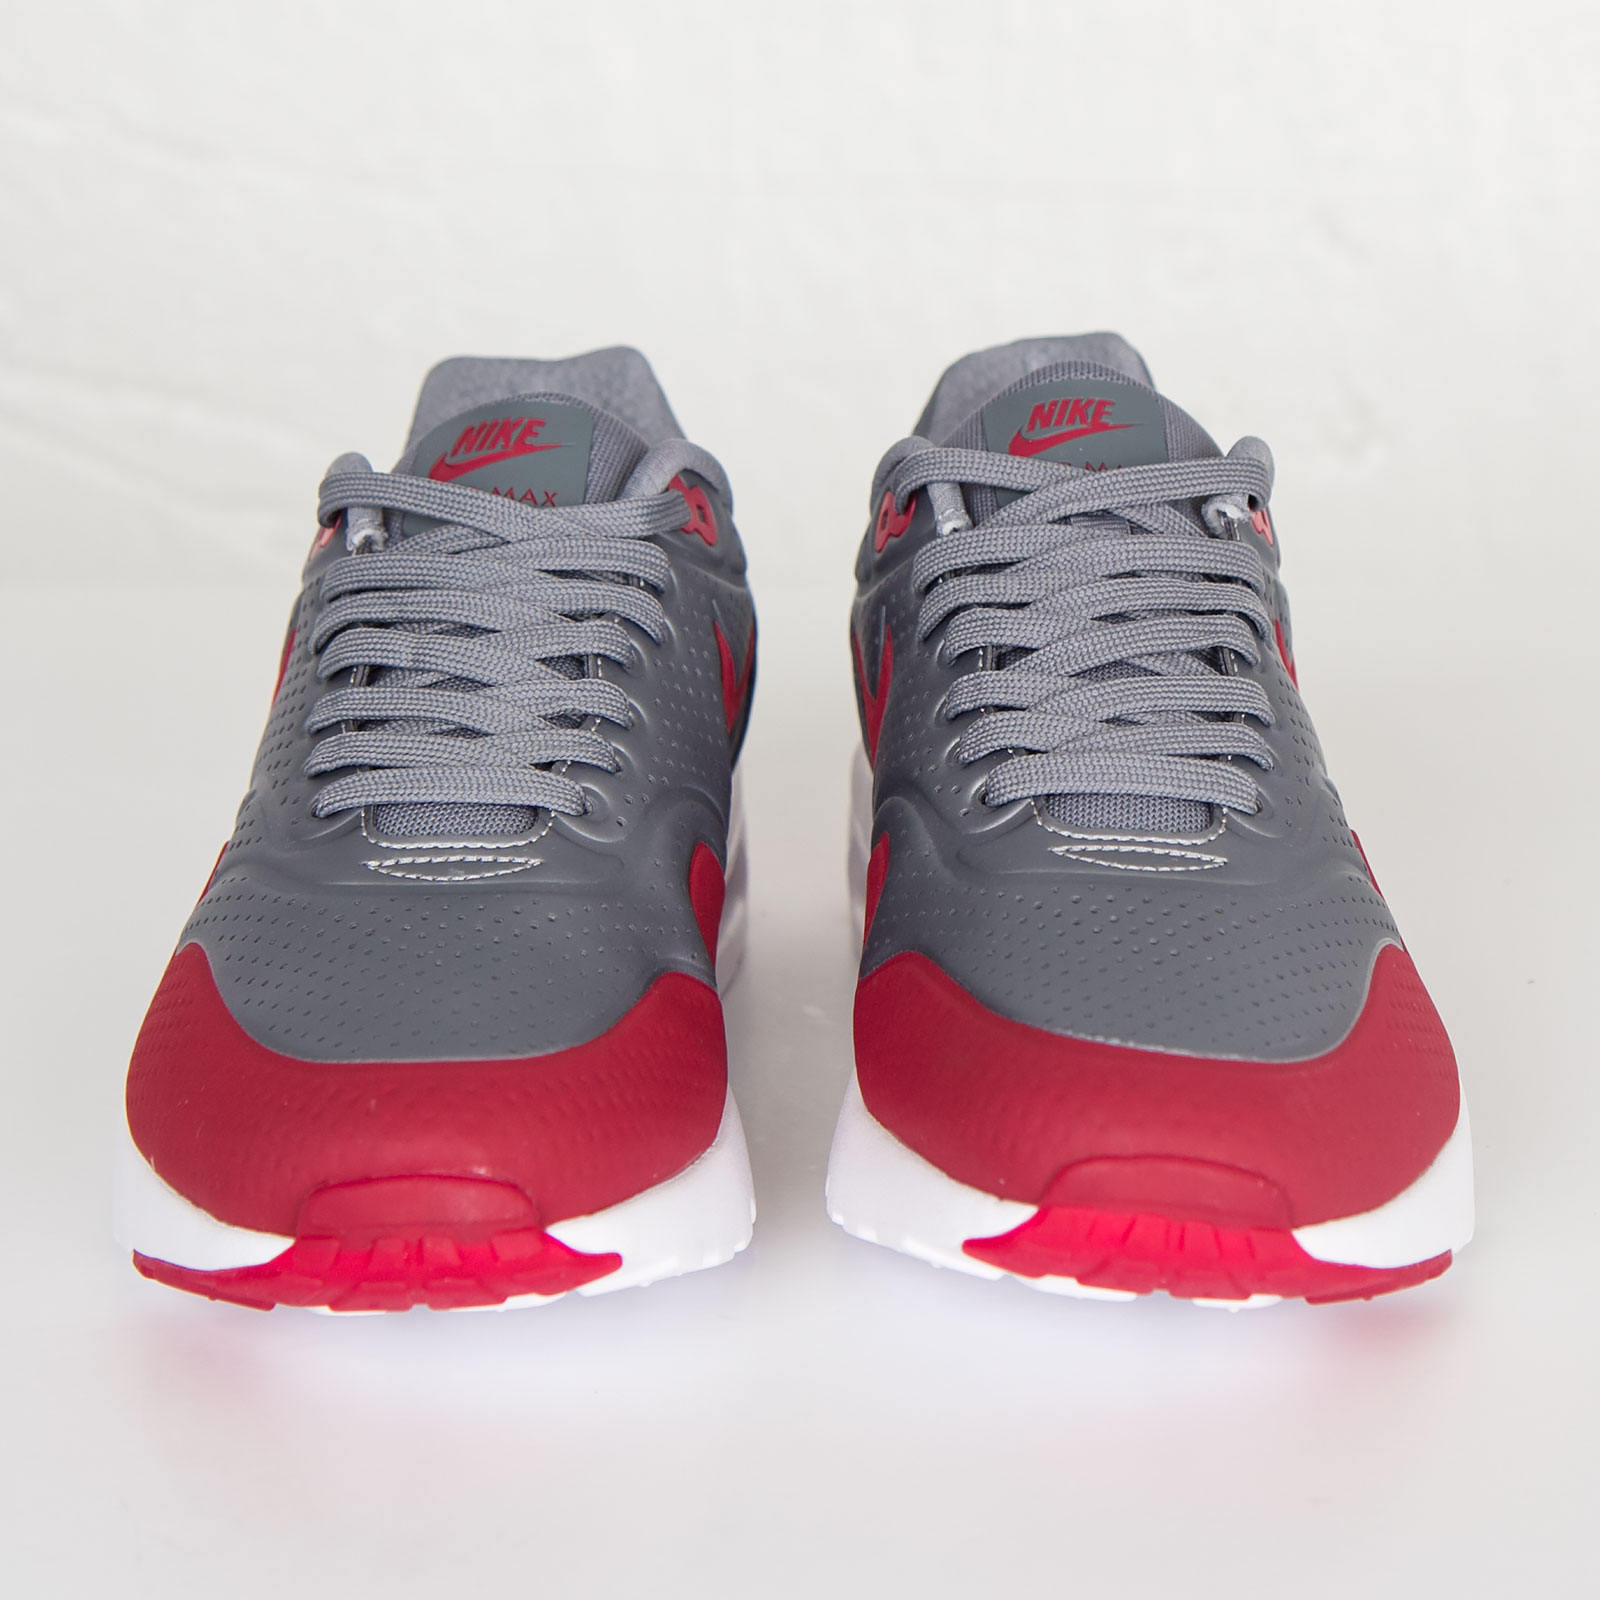 best service 2a4d0 bb0e2 Nike Air Max 1 Ultra Moire - 705297-006 - Sneakersnstuff   sneakers    streetwear online since 1999